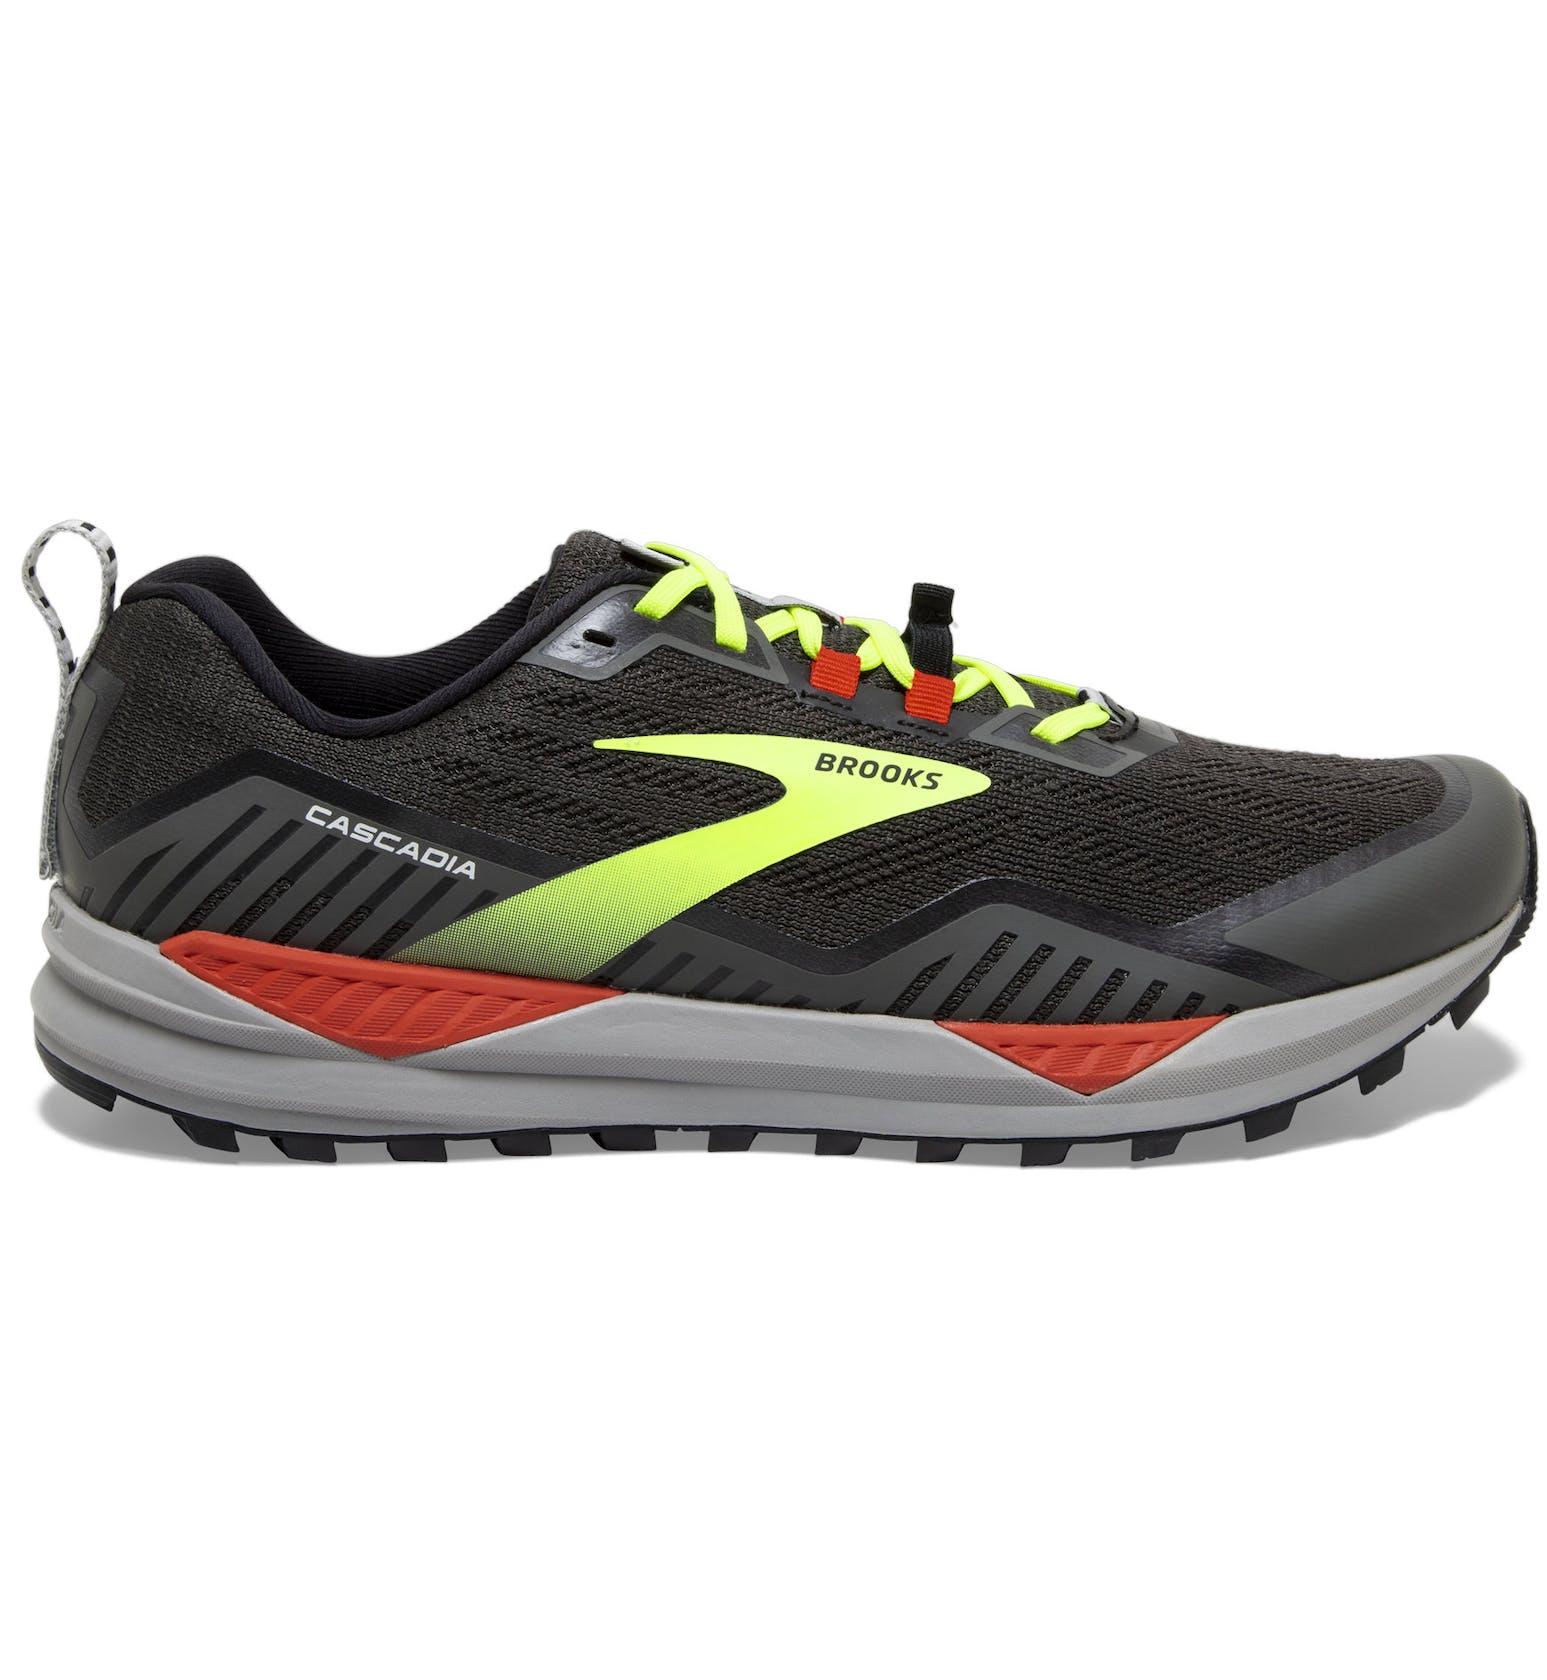 Brooks Cascadia 15 - scarpe trail running - uomo